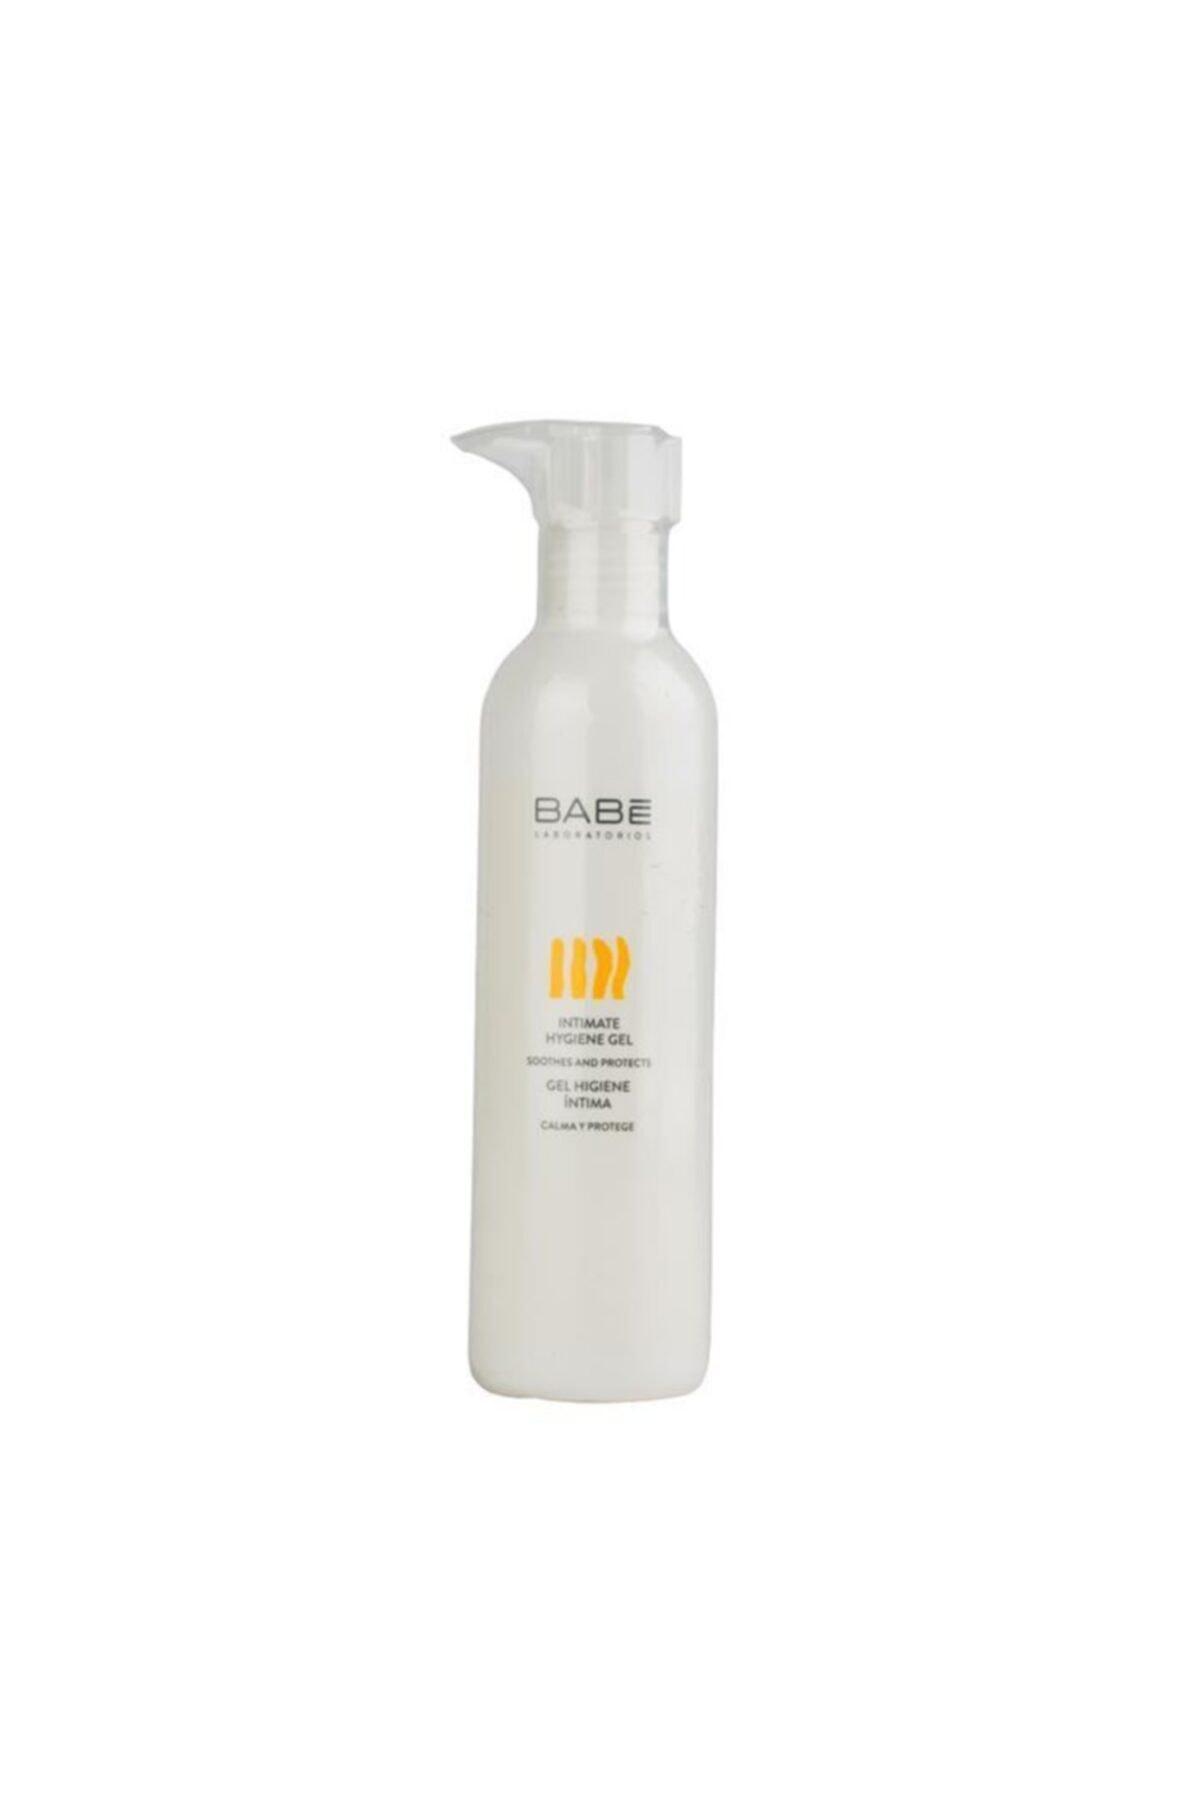 Babe Intimate Hygiene Gel 250ml 1